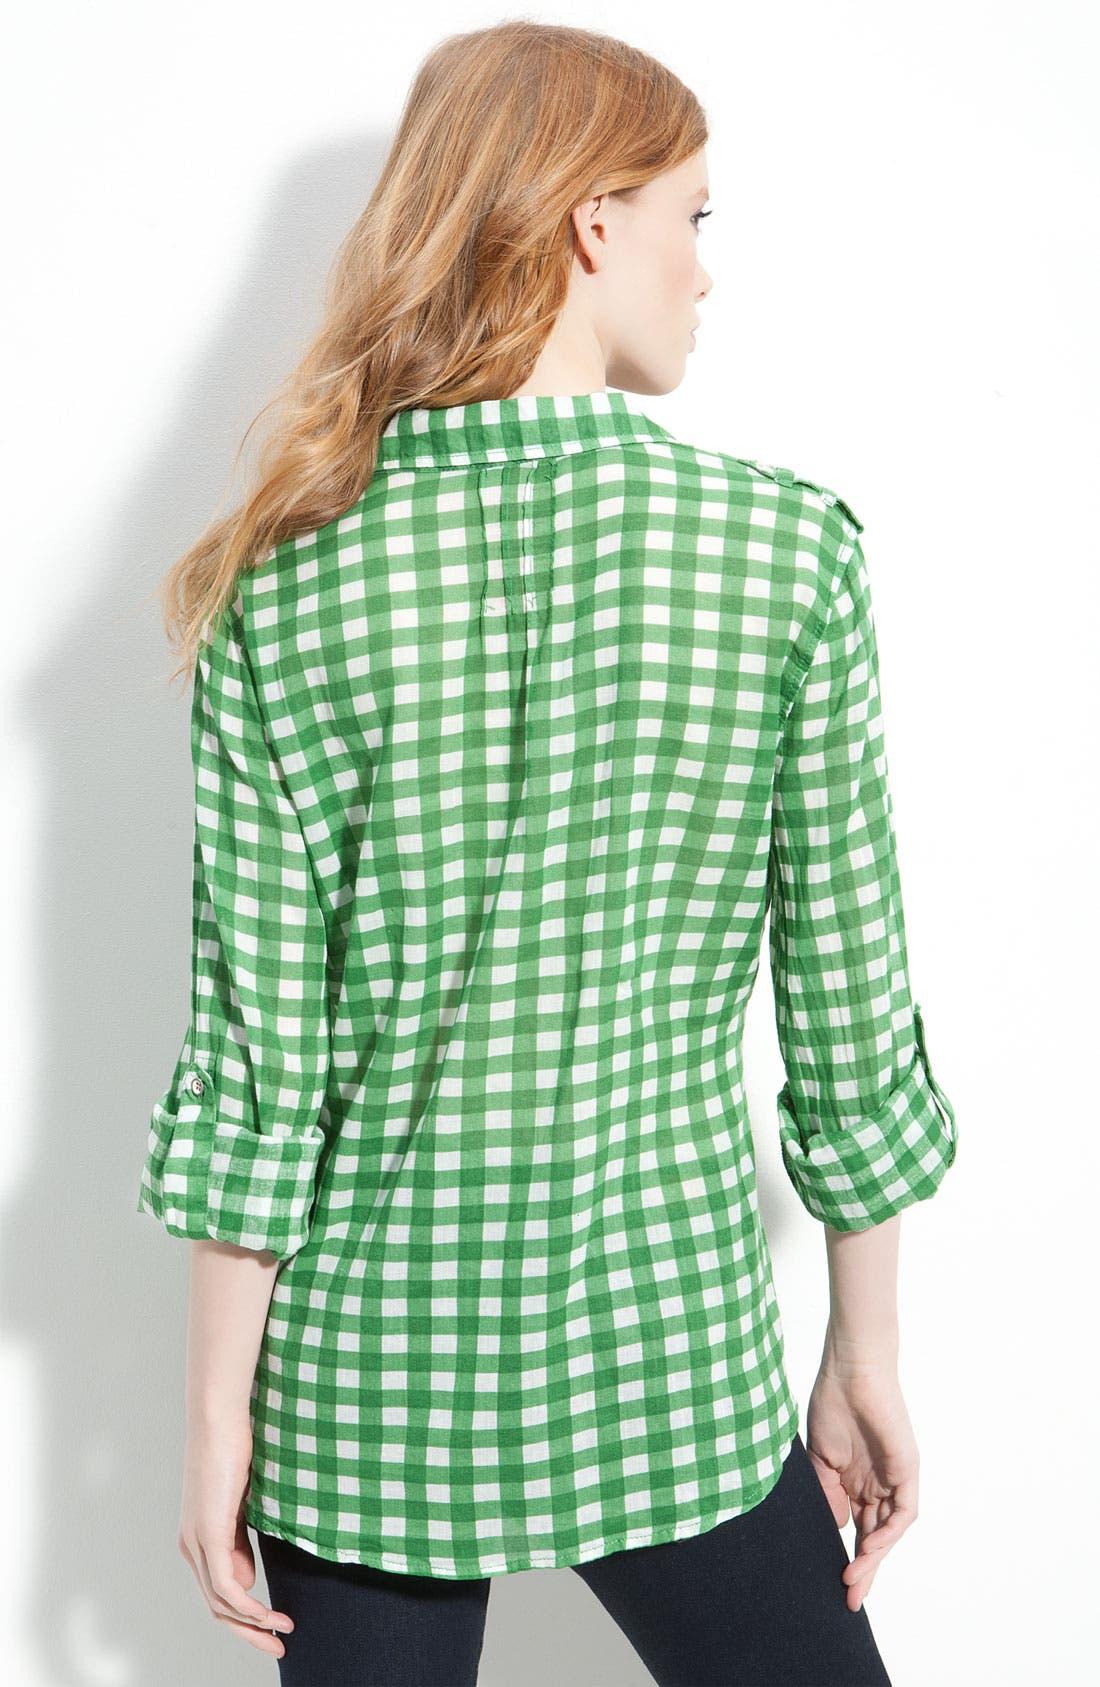 Gingham Check Western Pocket Shirt,                             Alternate thumbnail 2, color,                             Green Gingham